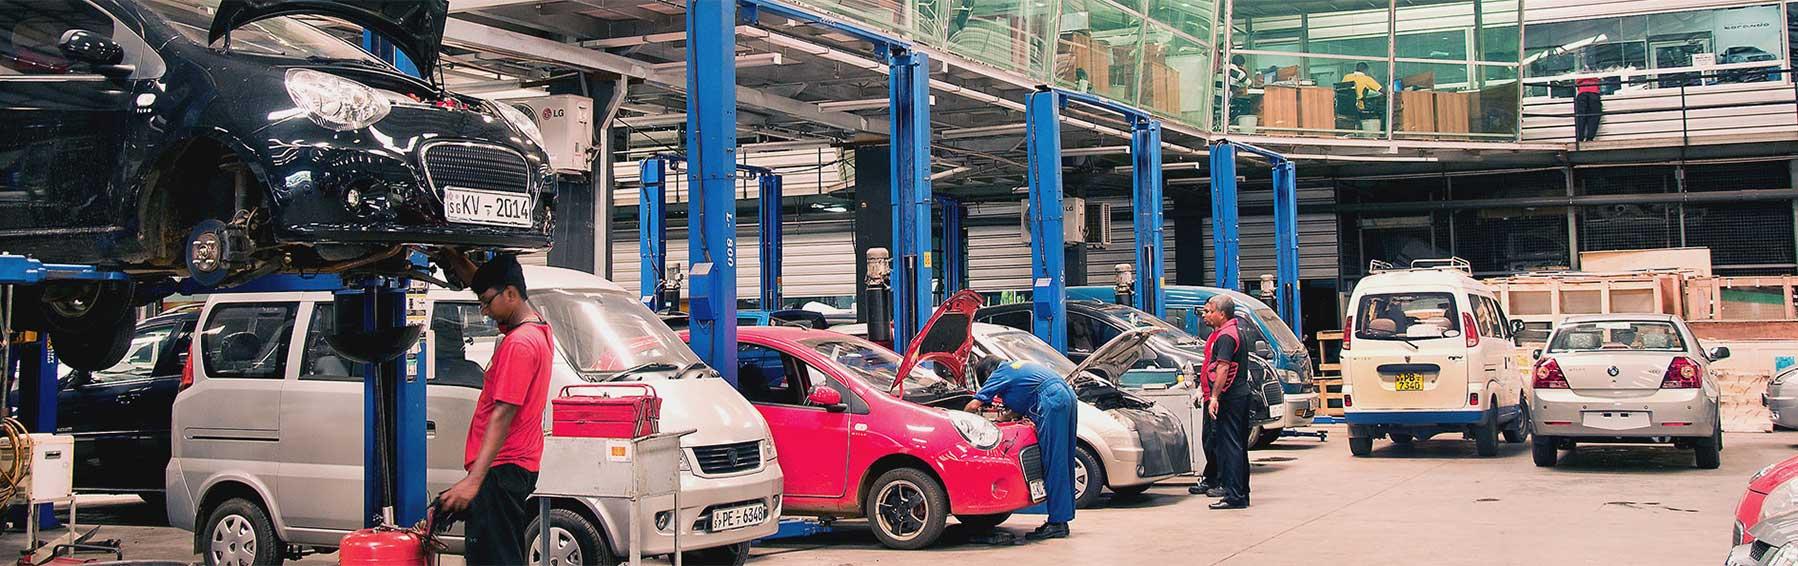 Automobiles companies in Sri Lanka - Company List